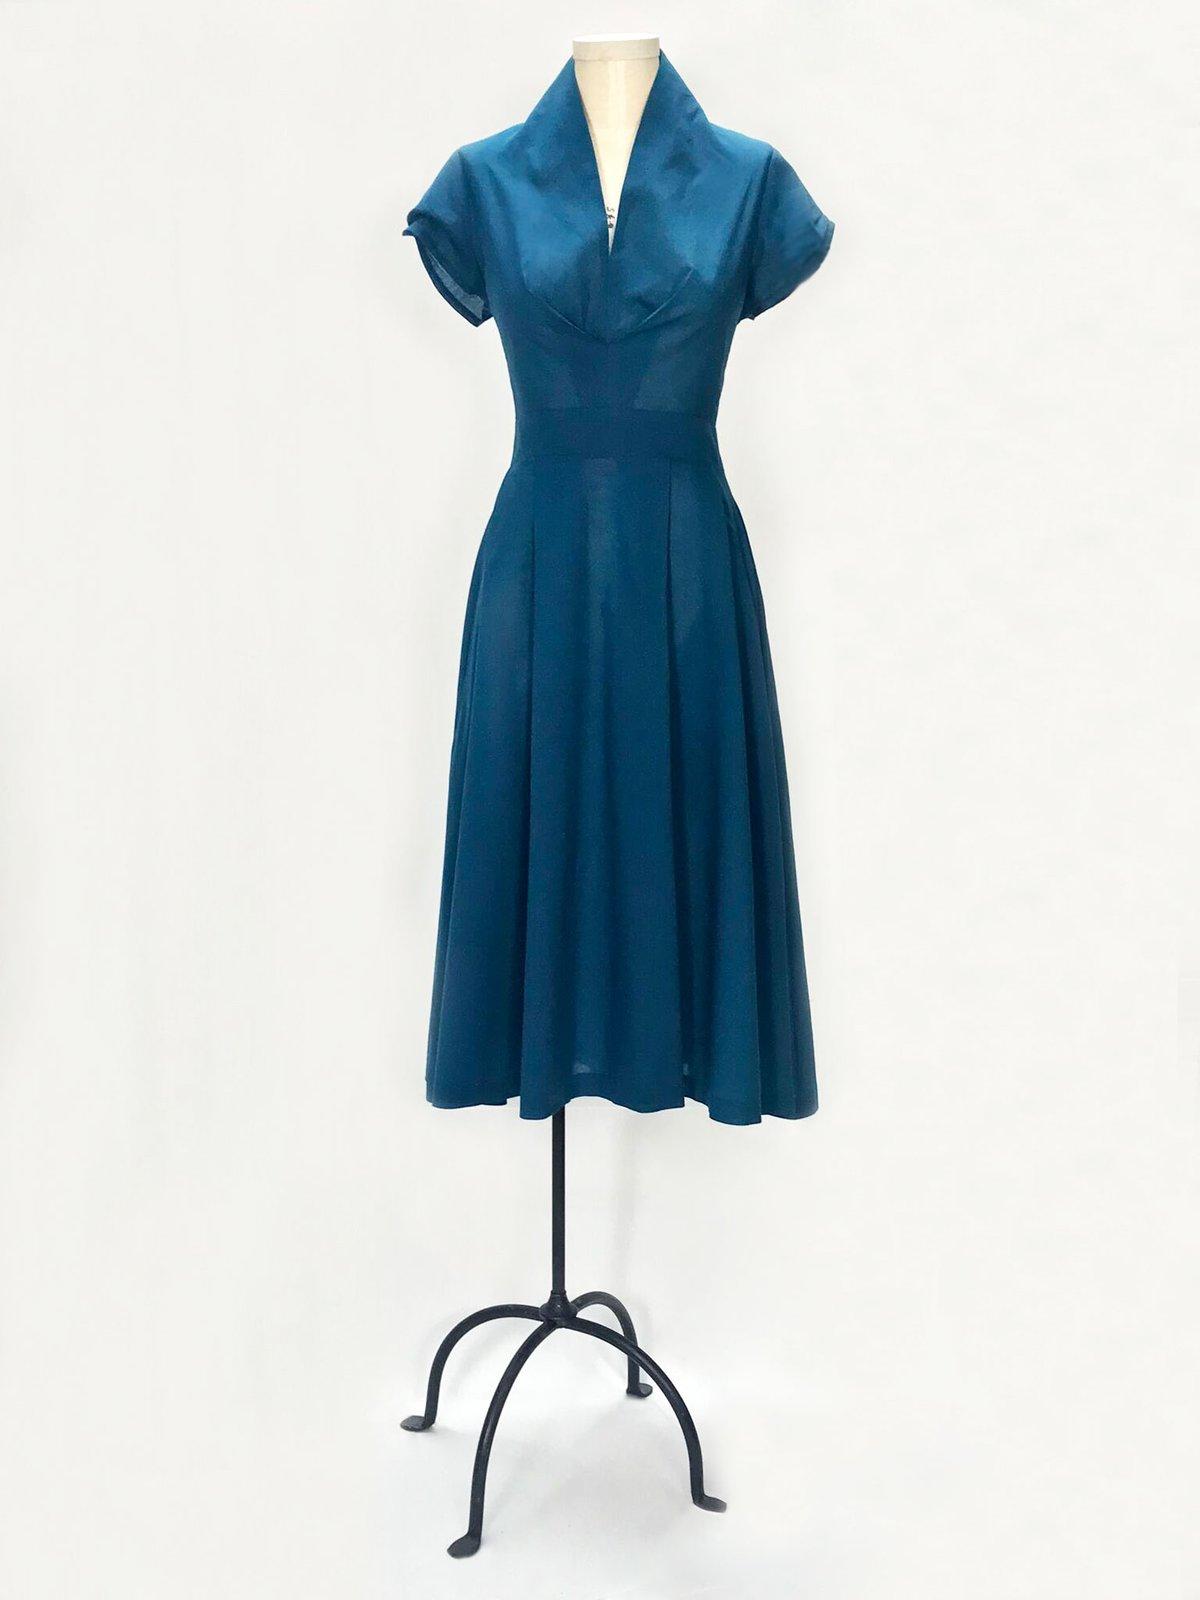 Image of Mona Van Seuss Dress (Teal)